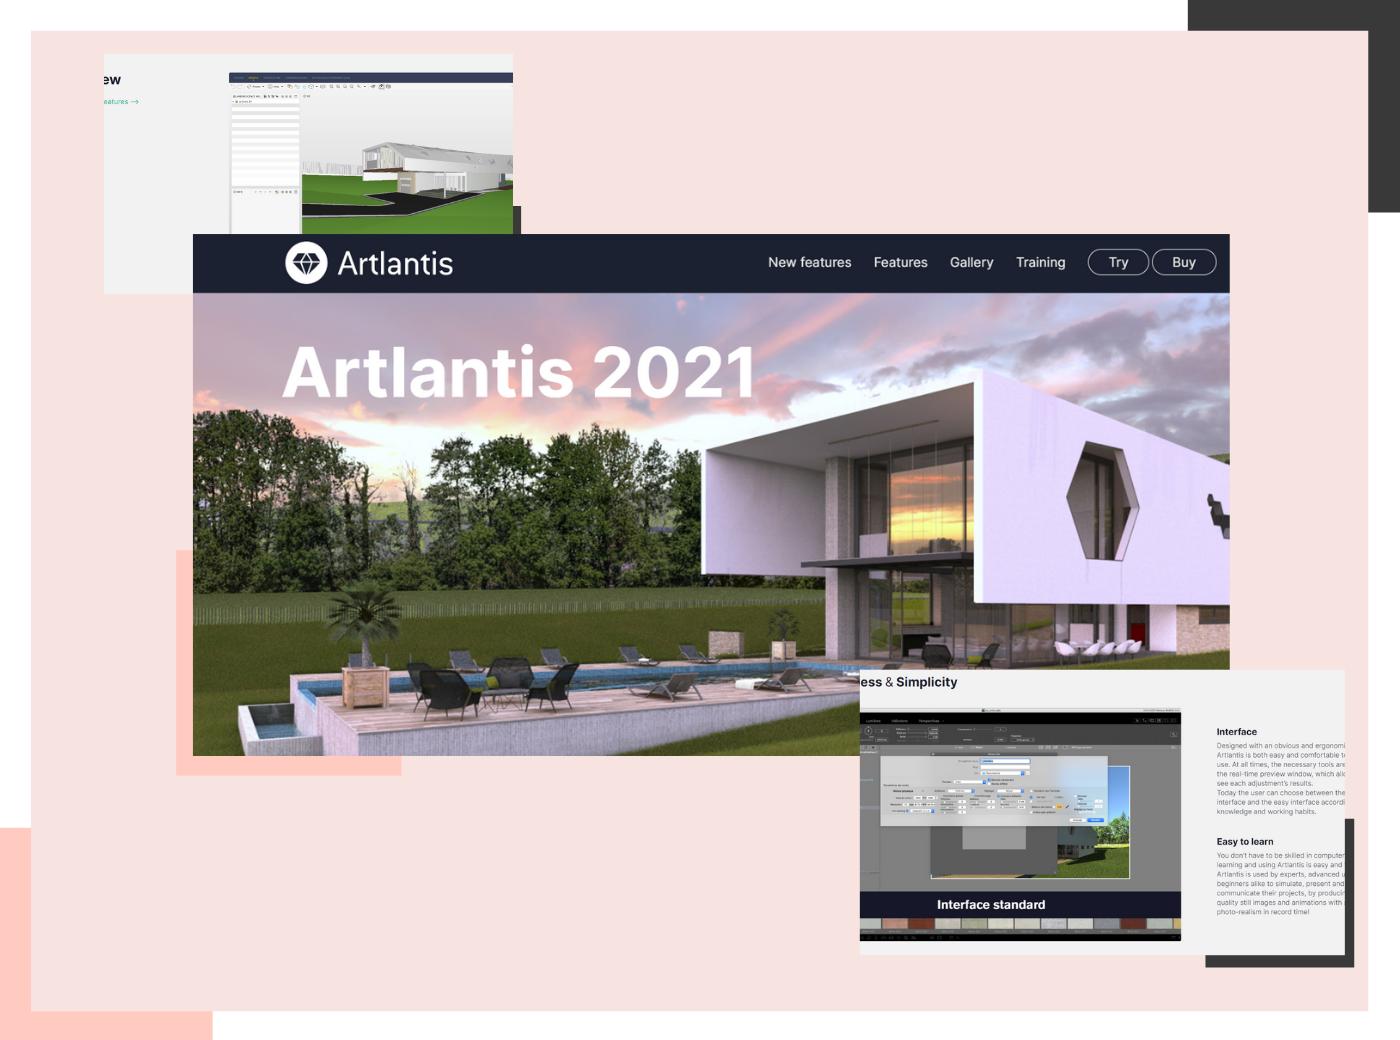 Artlantis rendering software